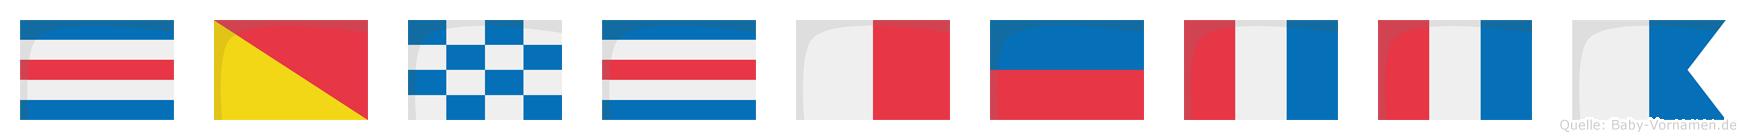 Conchetta im Flaggenalphabet